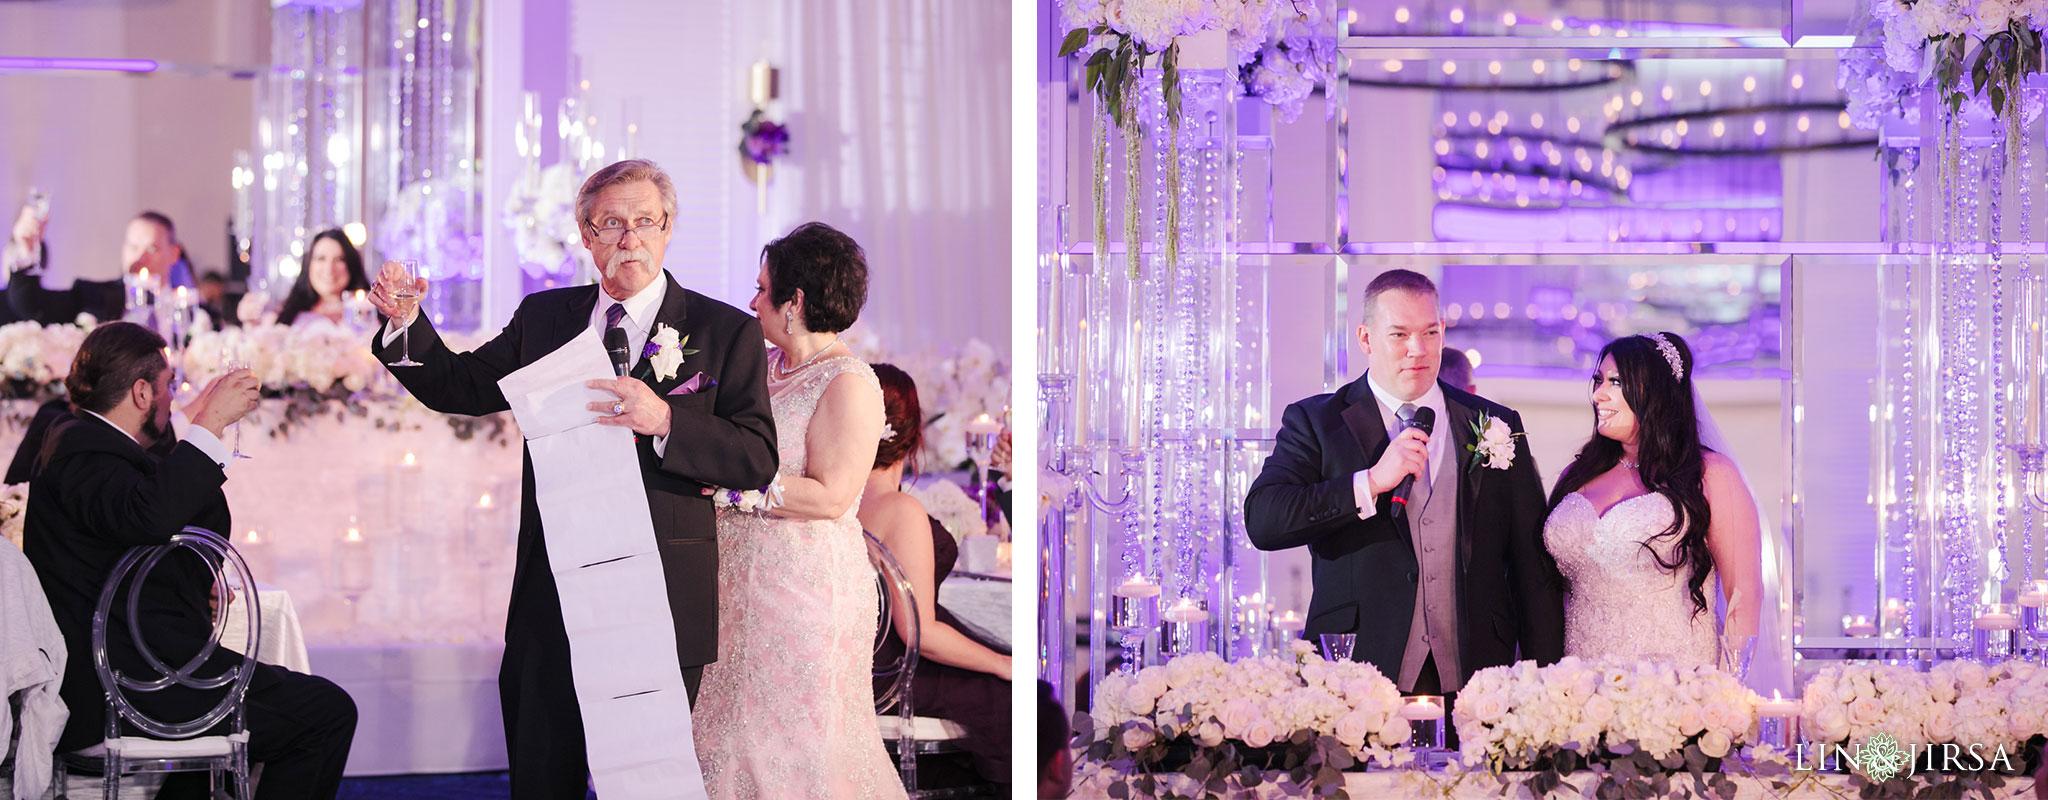 30 hilton waterfront beach resort wedding photography